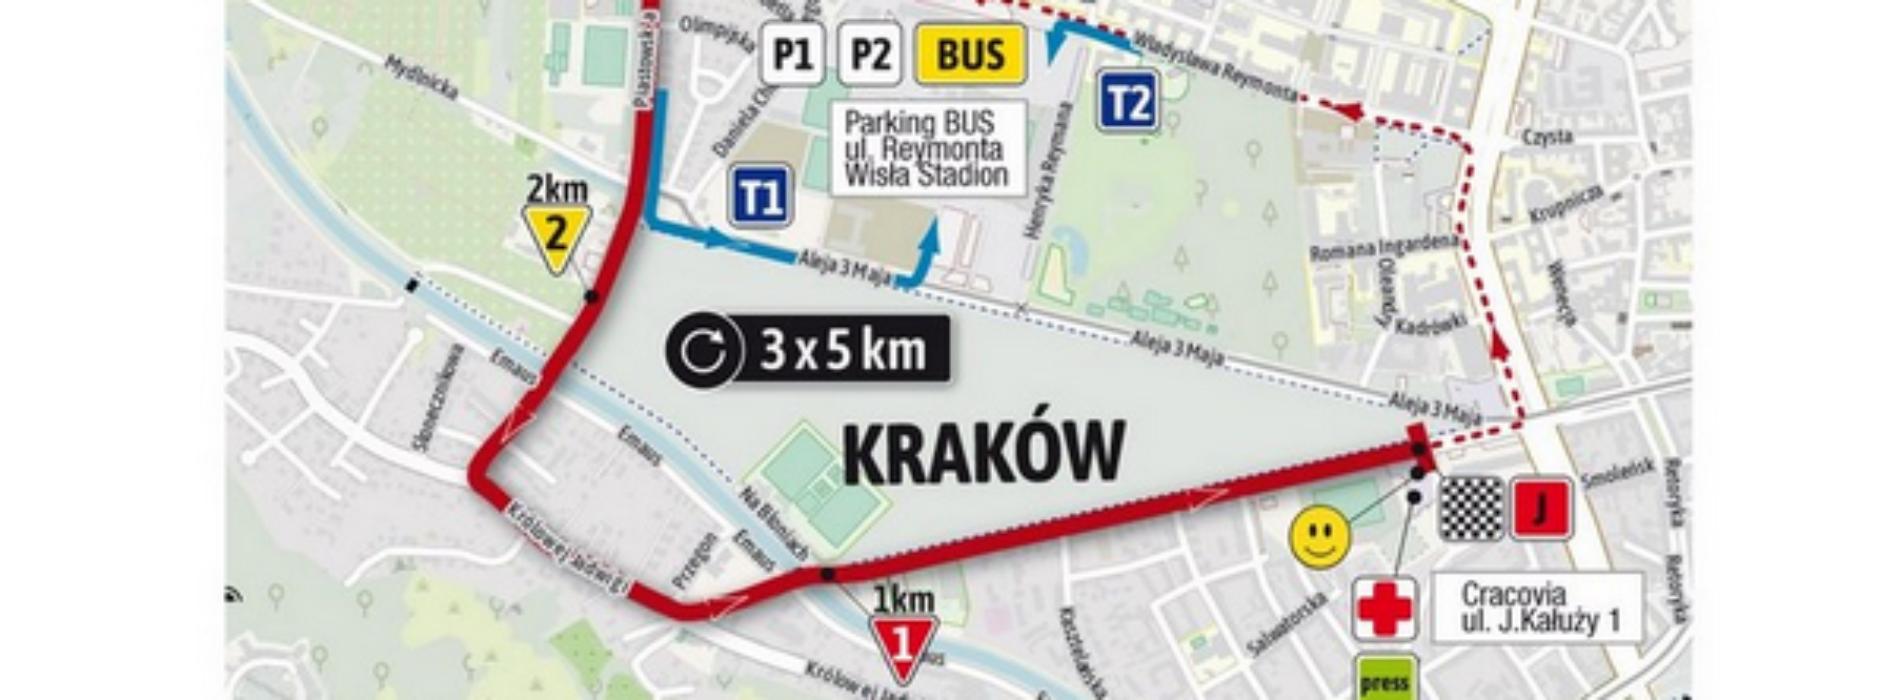 Utrudnienia w ruchu na terenie Krakowa w trakcie 78. Tour de Pologne